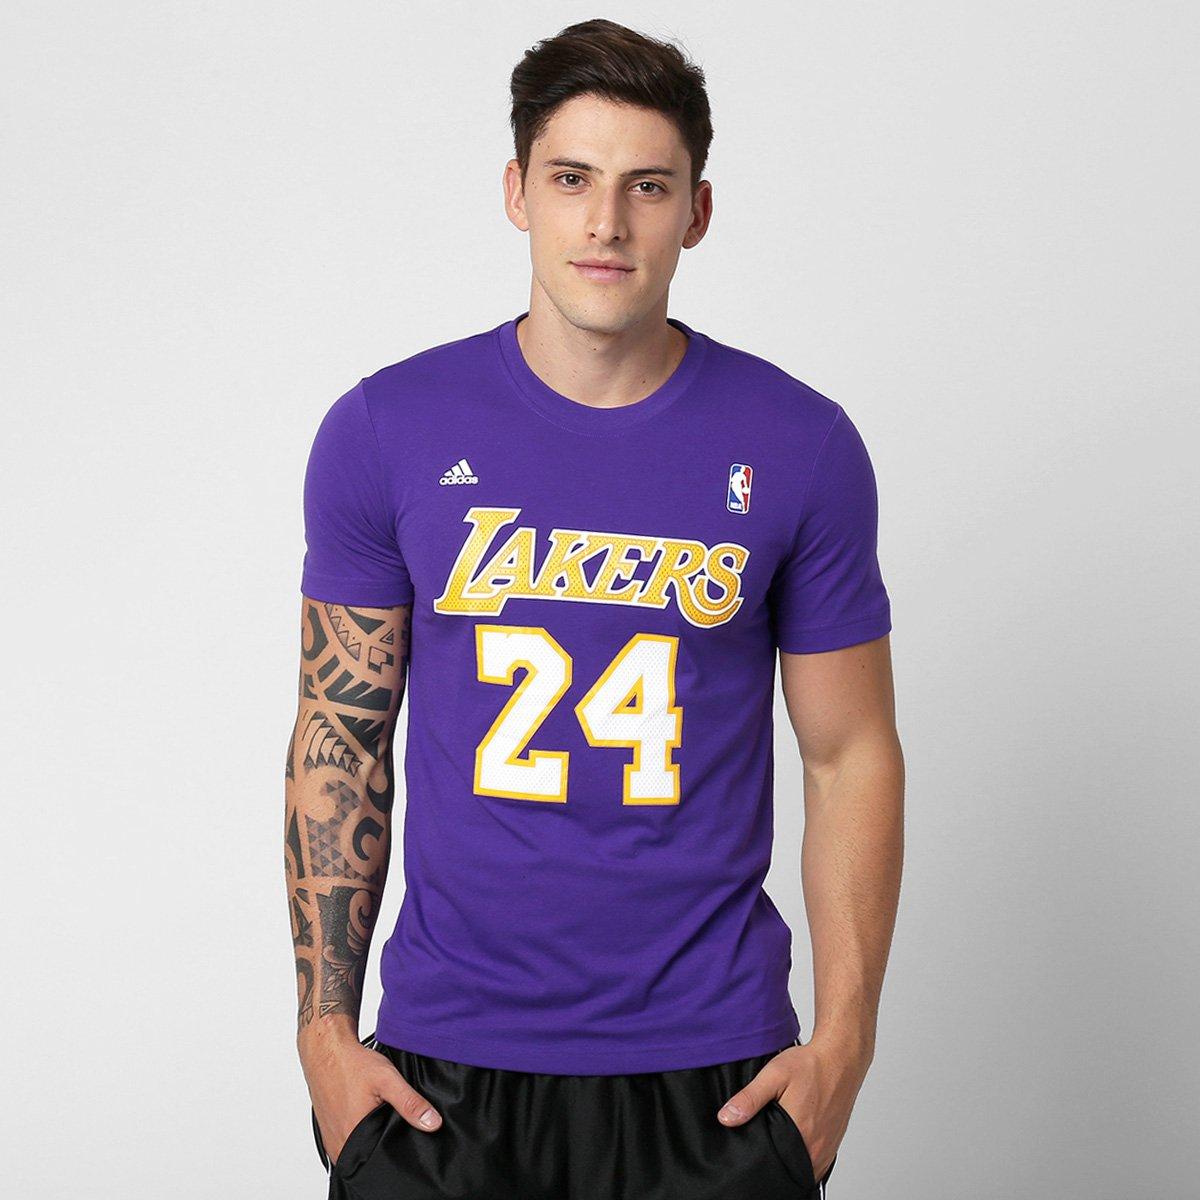 8a98937051c31 Camiseta Adidas Gametime NBA Los Angeles Lakers - Compre Agora ...